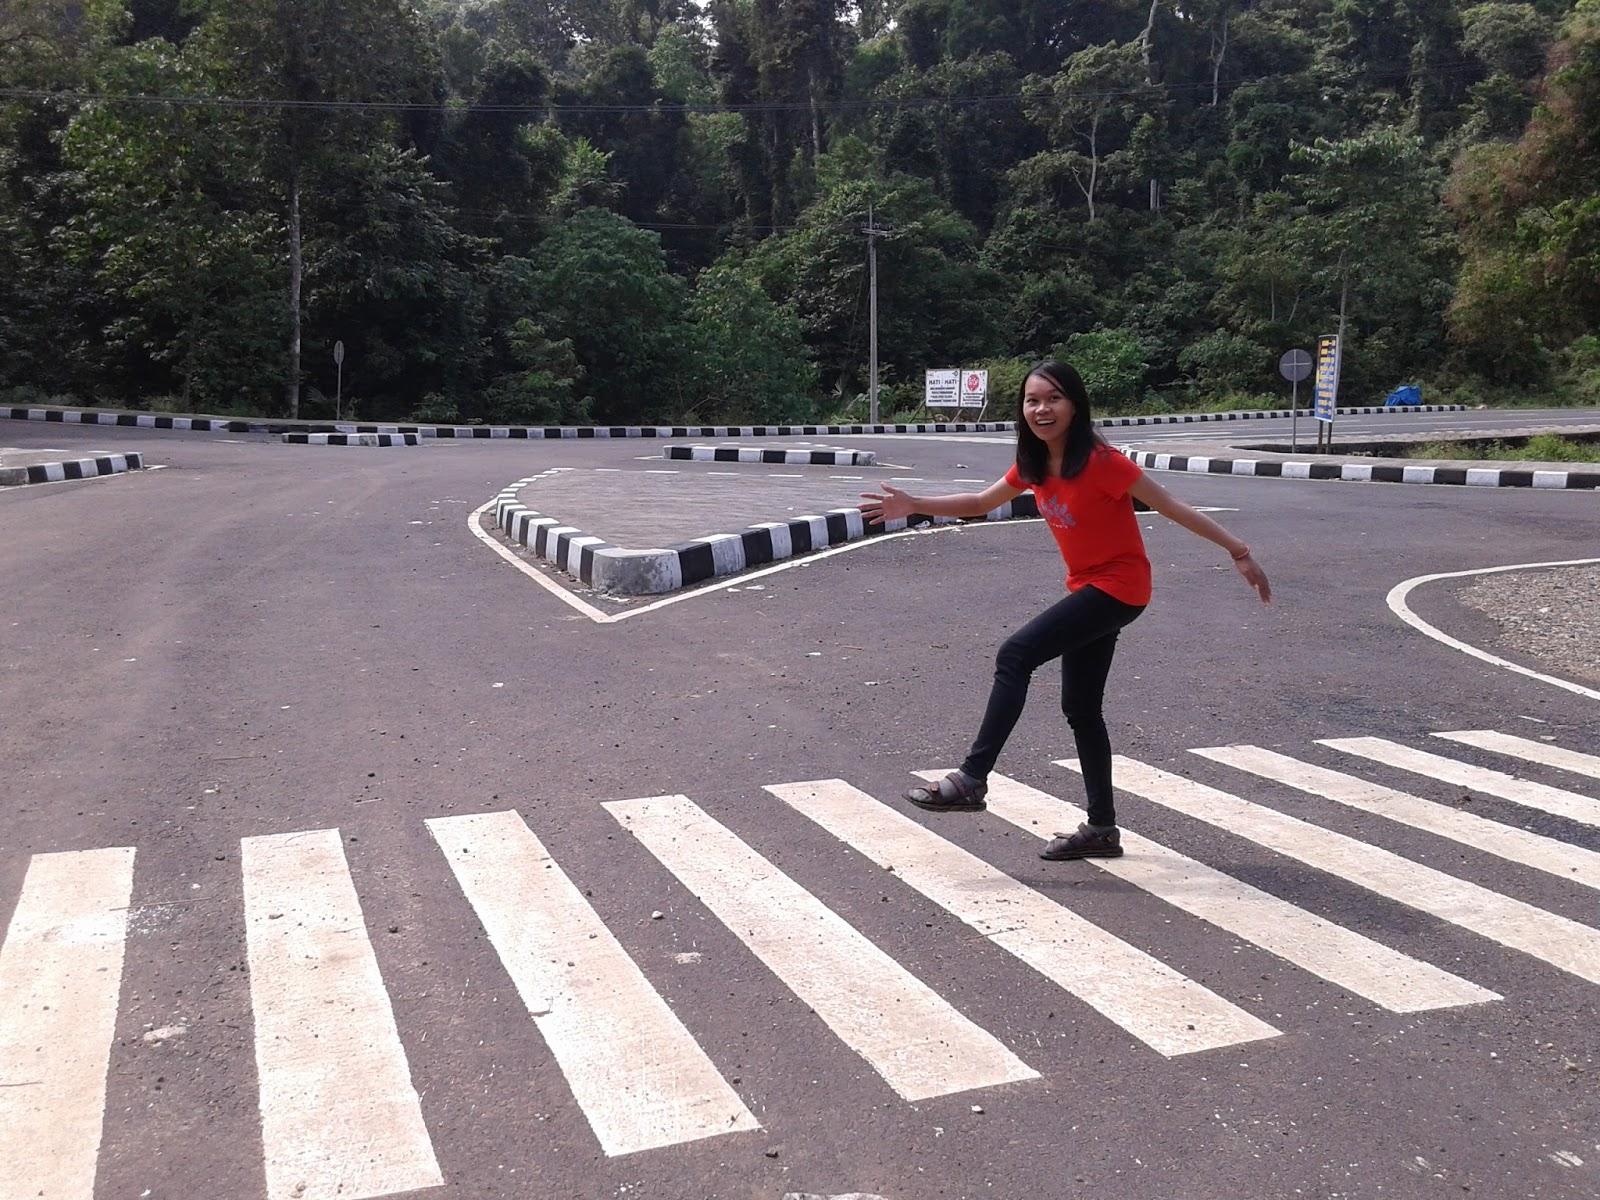 Review Pantai Selok Banyu Meneng Malang Selatan Pejalan Kaki Jalannya